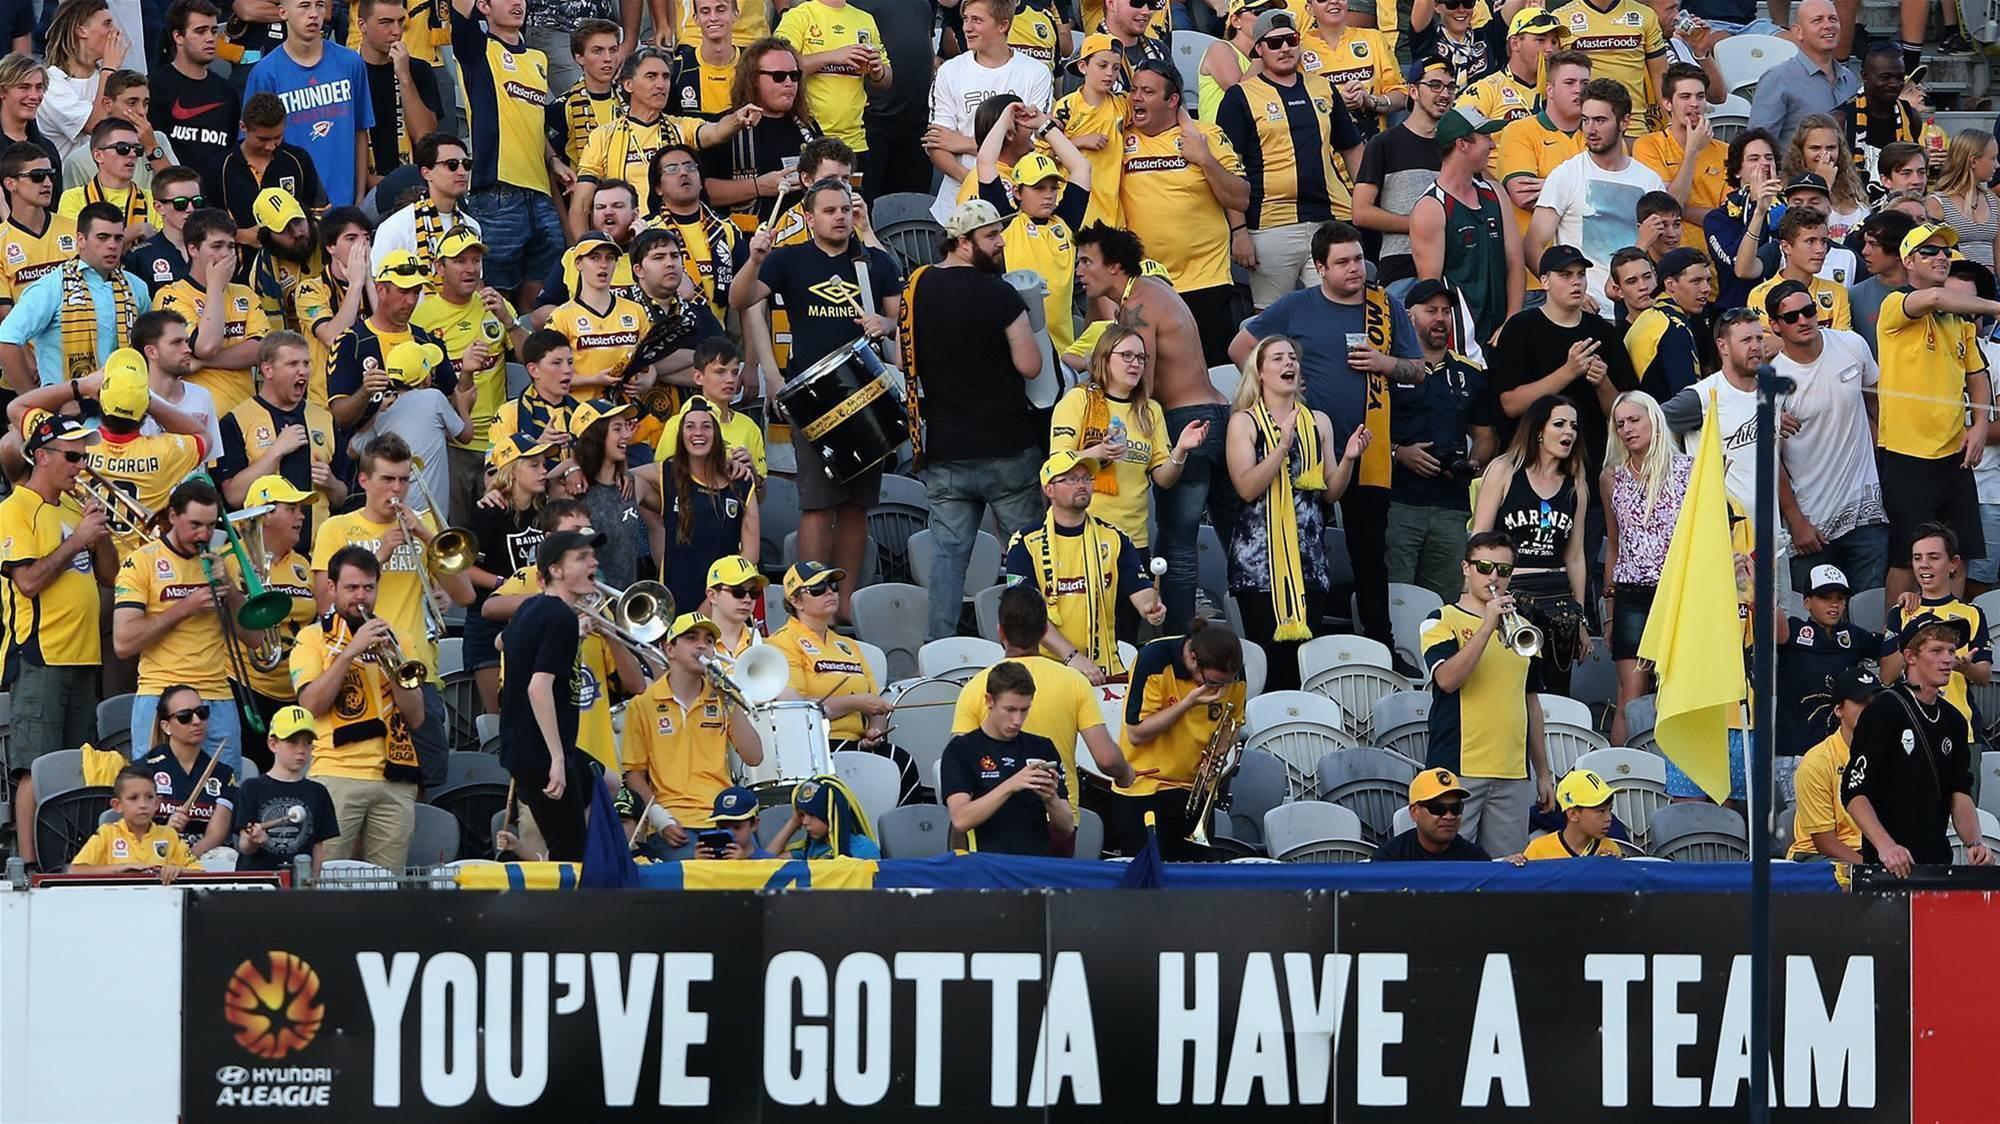 Mariners seek stadium rights, intend to build hotel